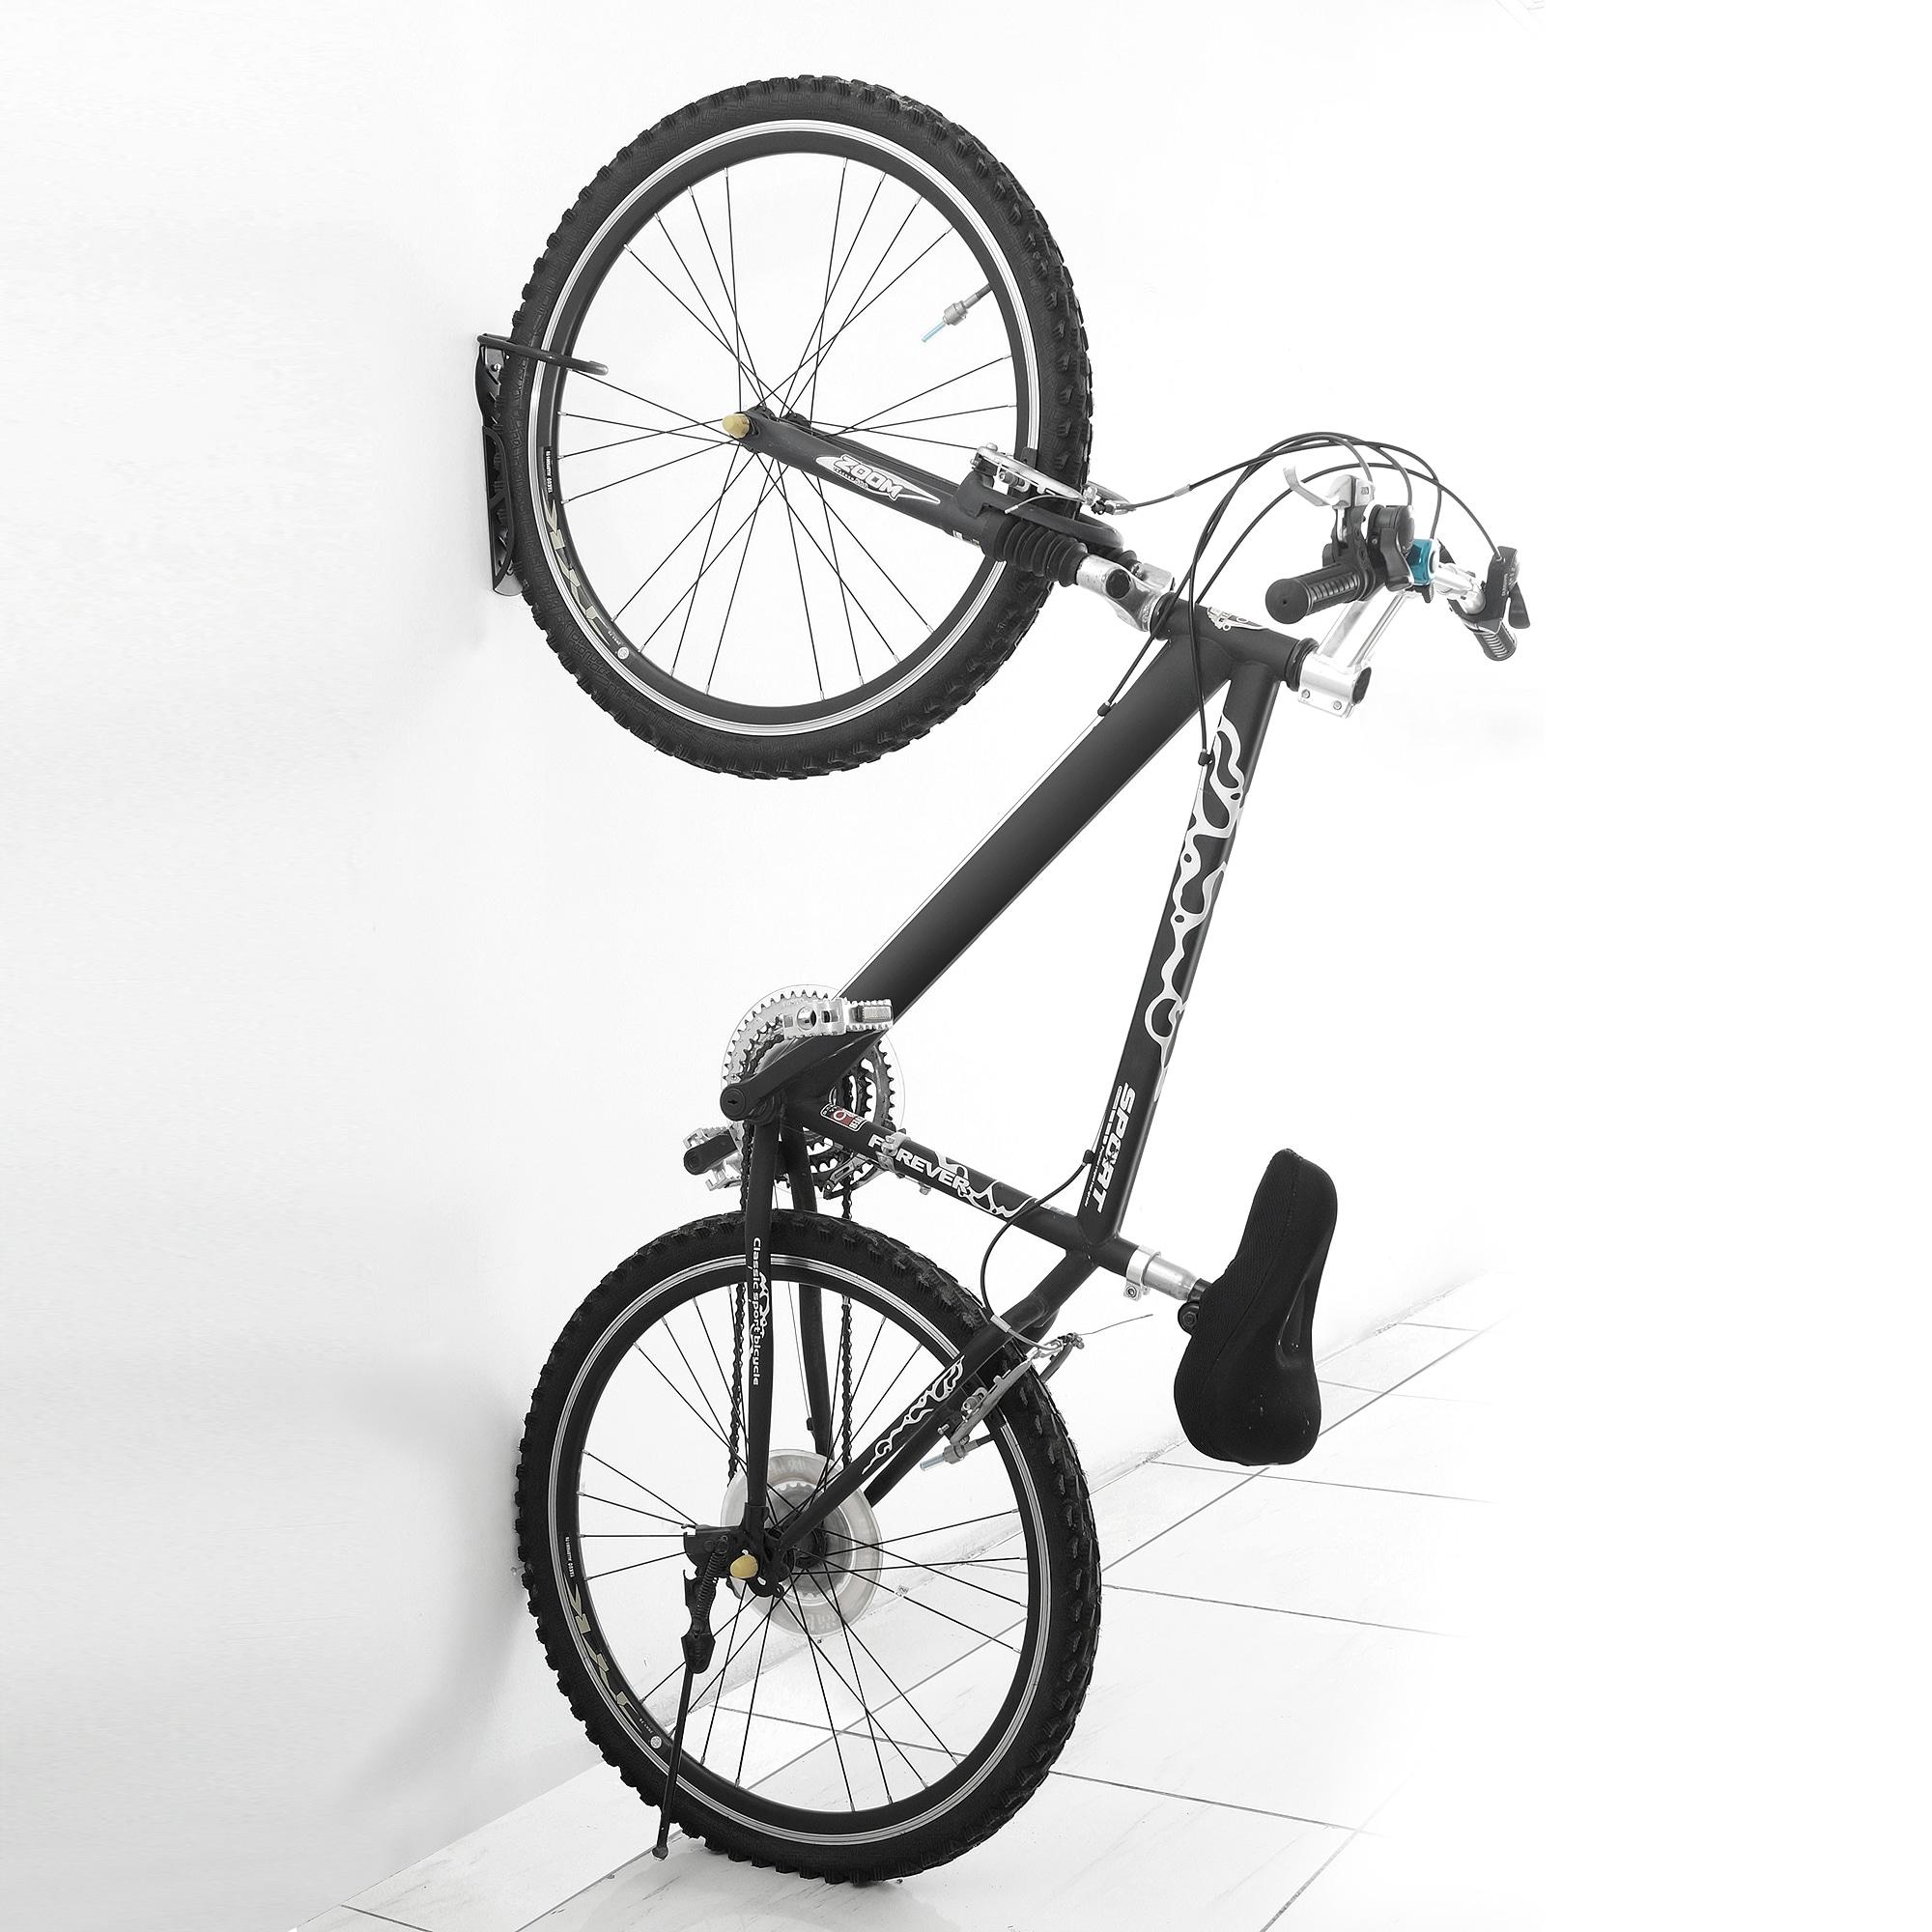 for bicicleta pin as guardar storage ideia prateleiras racks para bikes de dentro bike casa garage